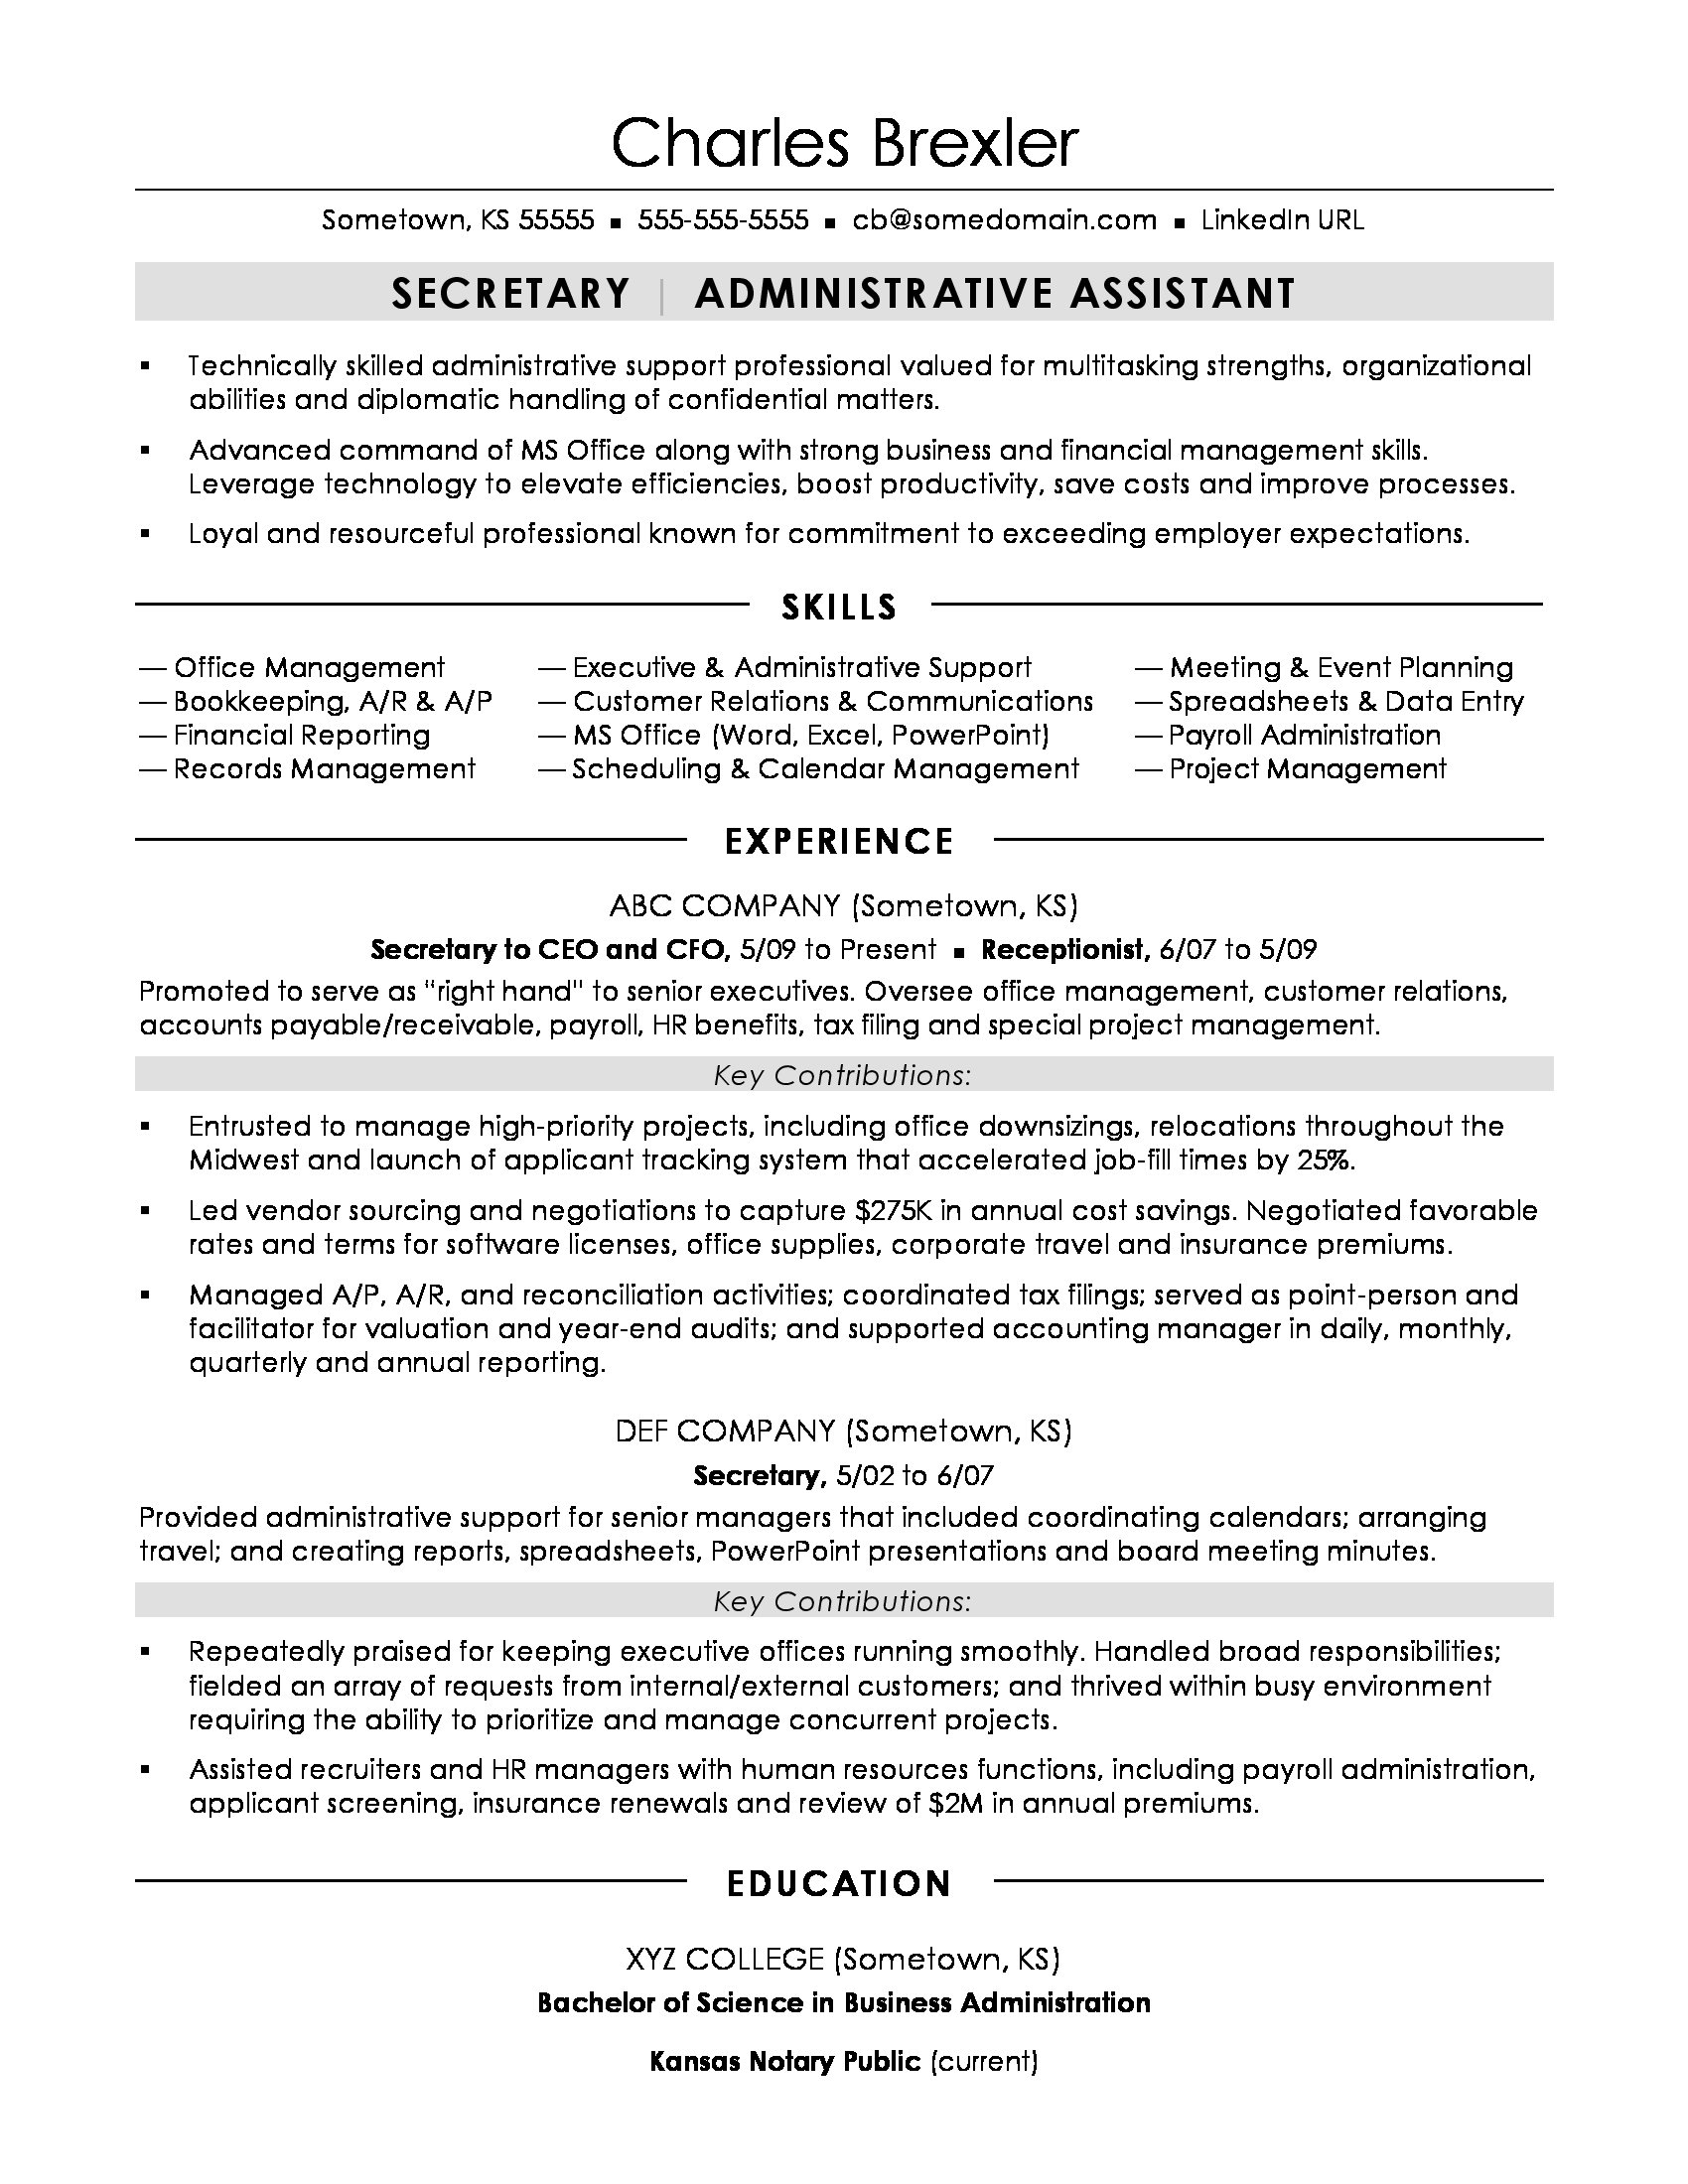 office resume samples for secretaries